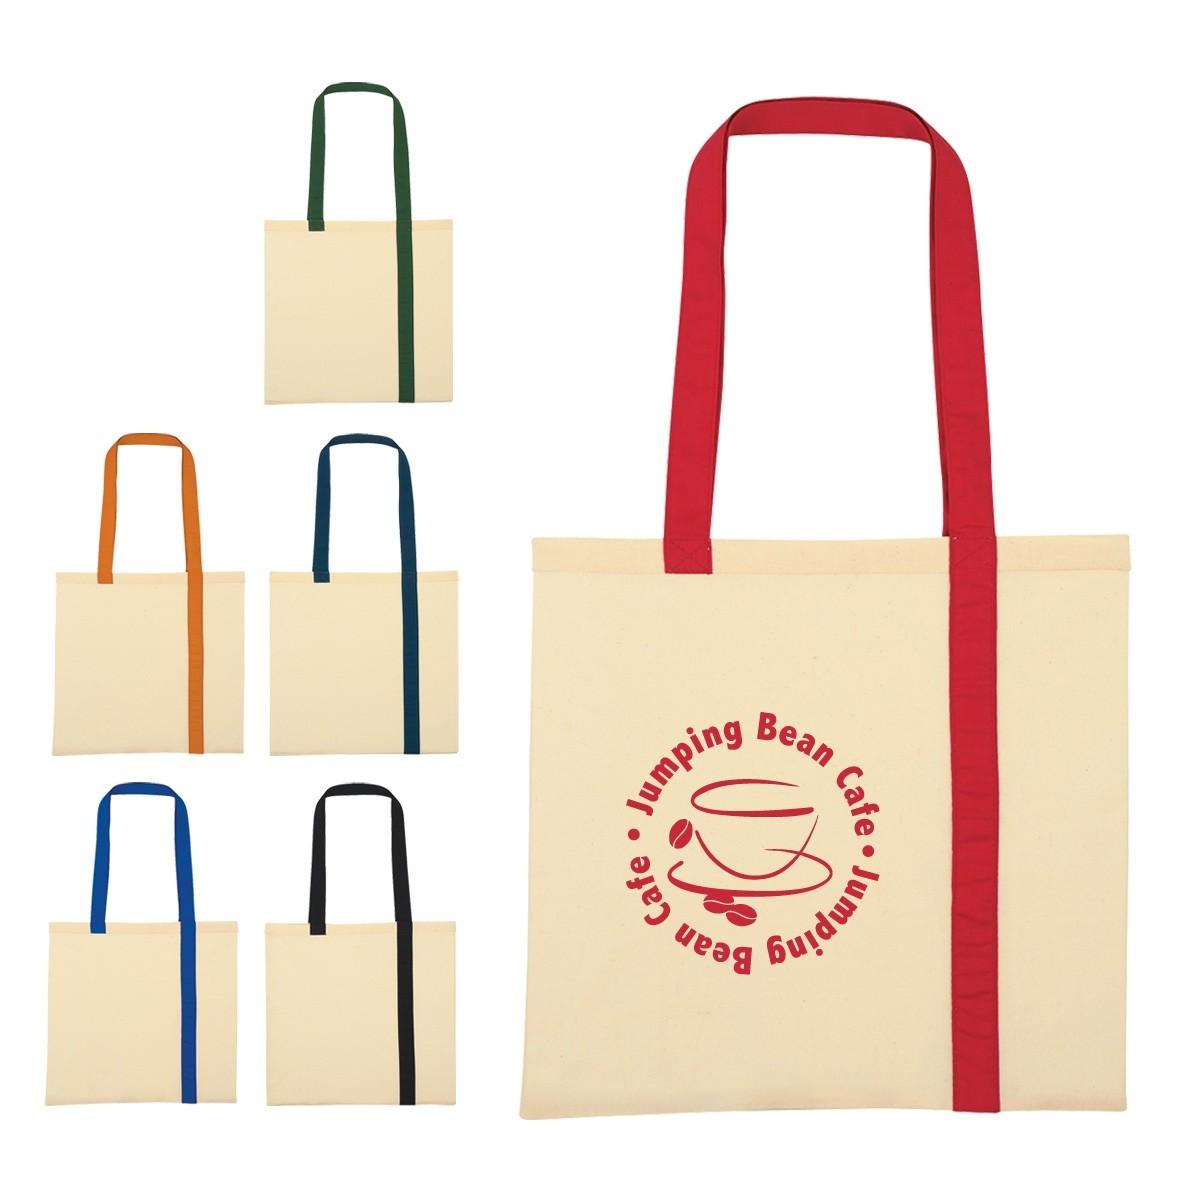 2019 Quick Seller Striped Economy Cotton Canvas Tote Bag